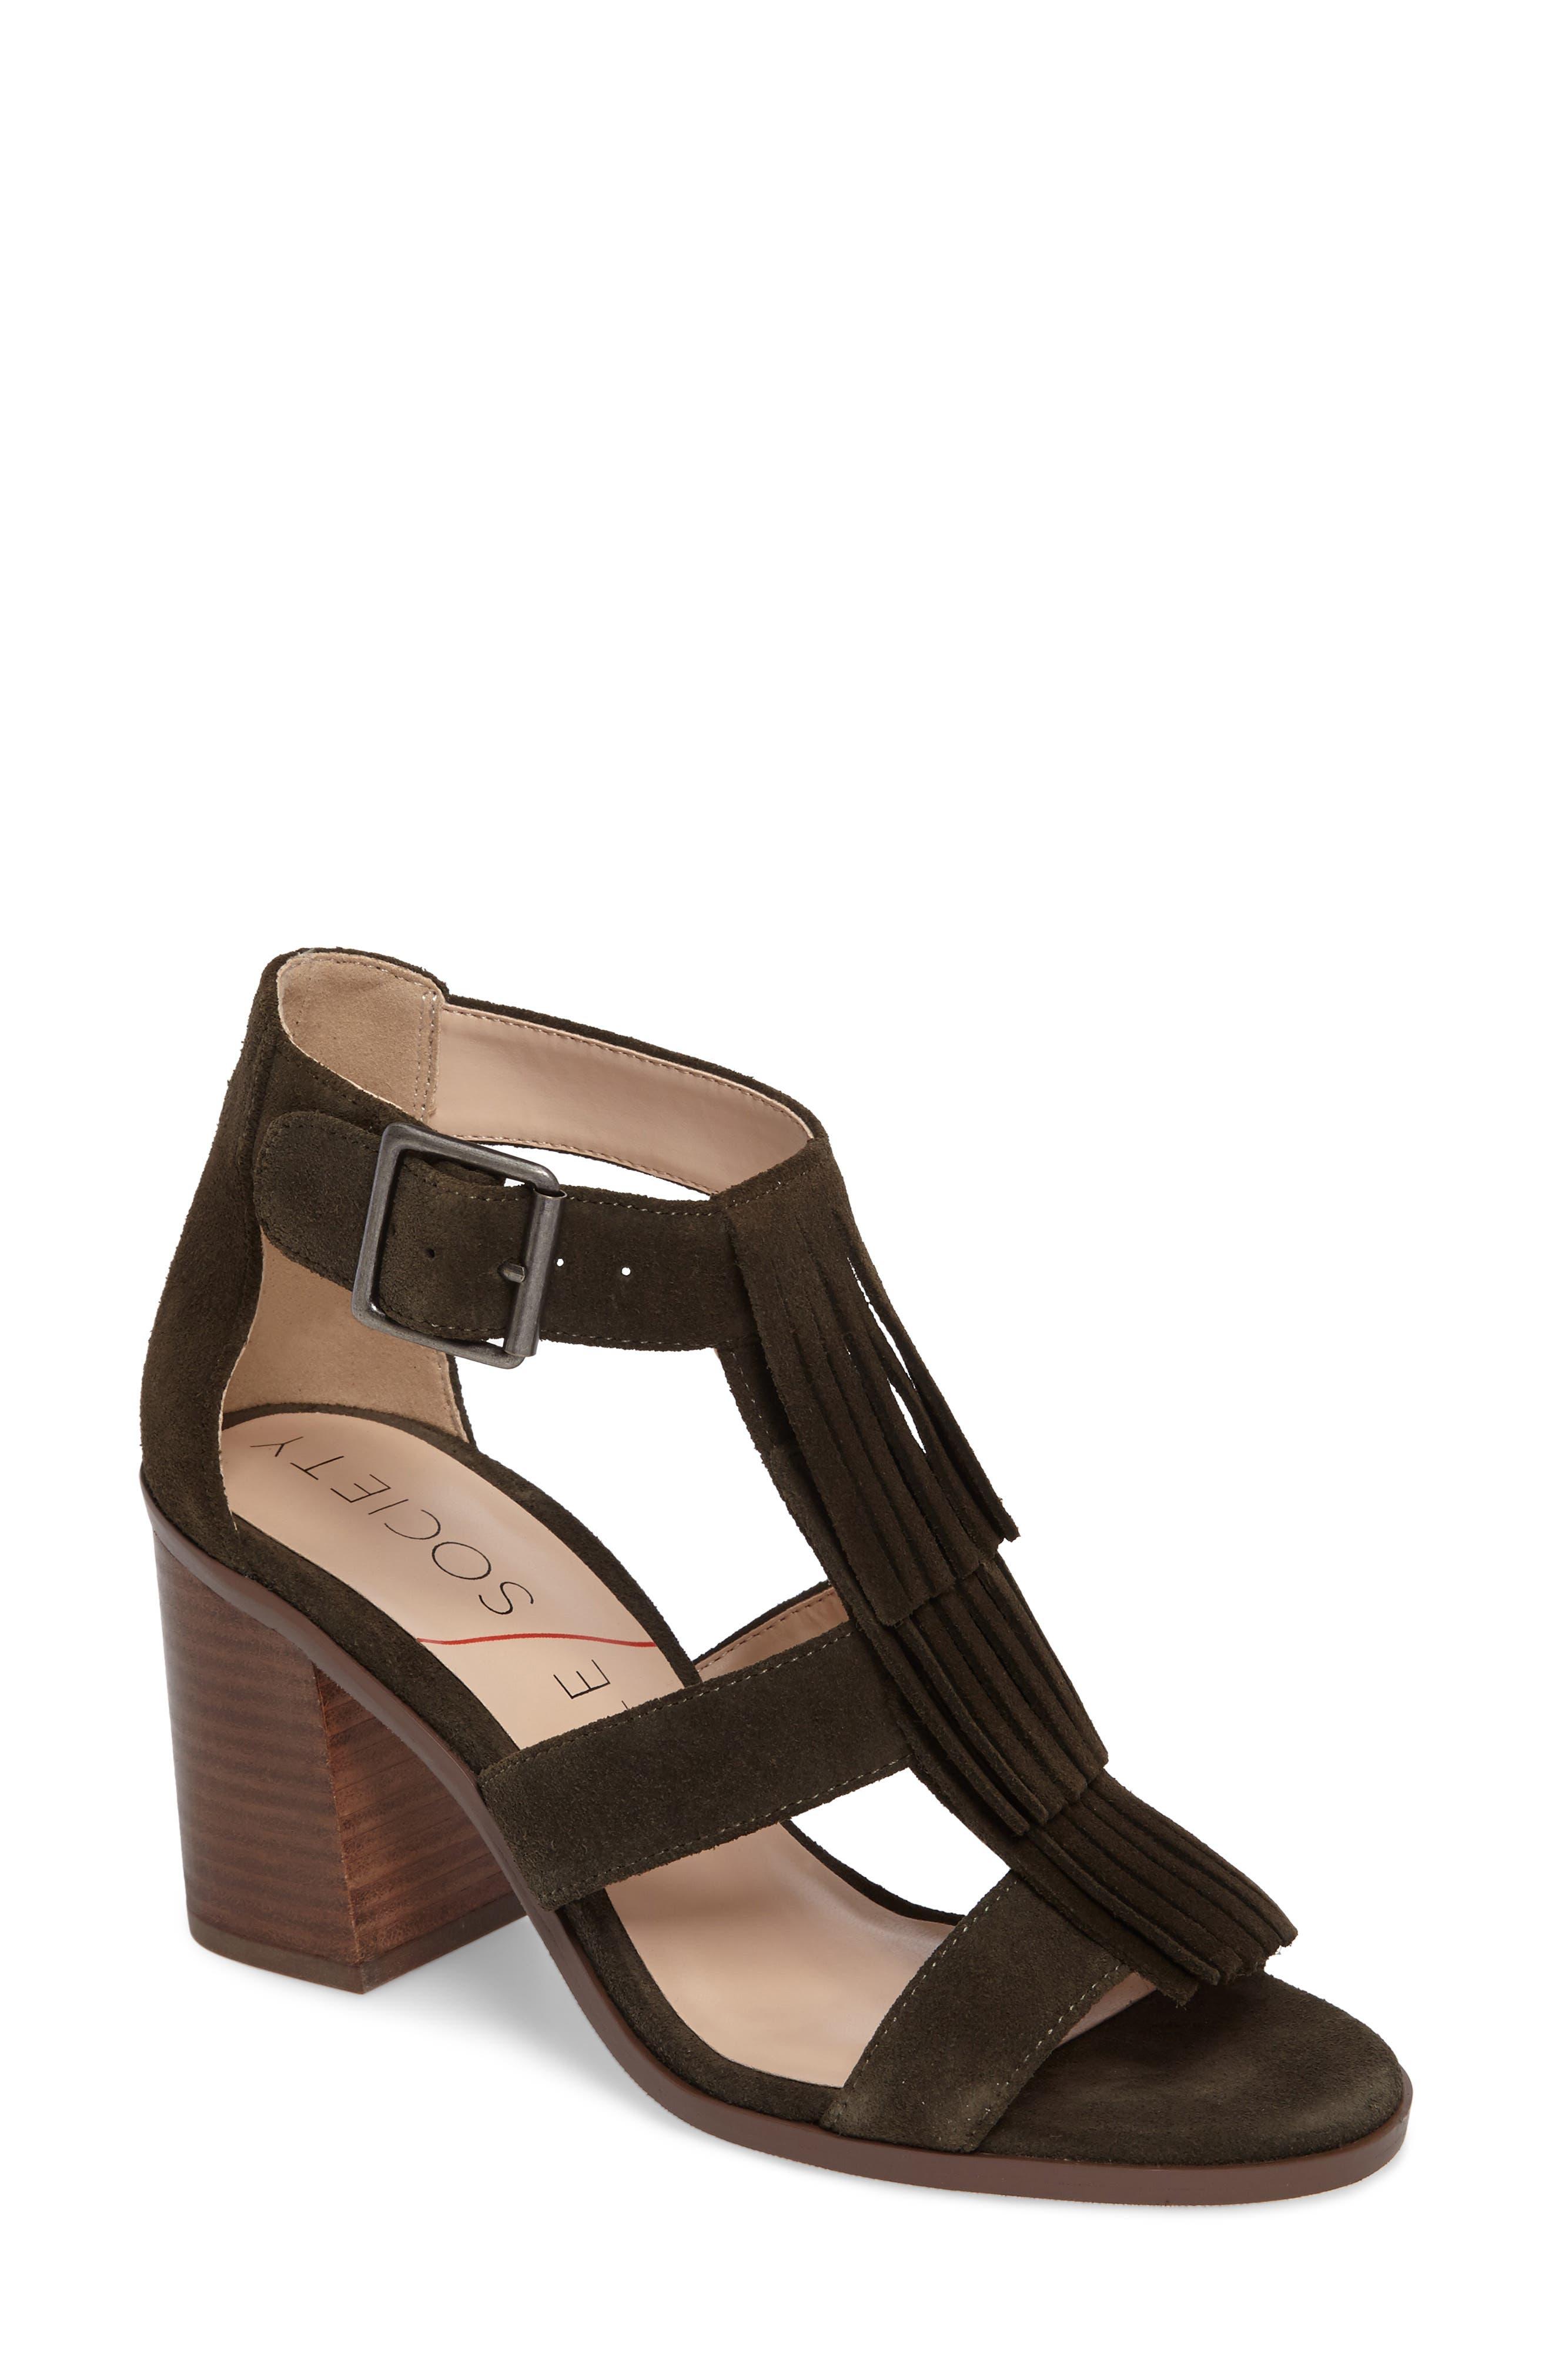 SOLE SOCIETY 'Delilah' Fringe Sandal, Main, color, 301